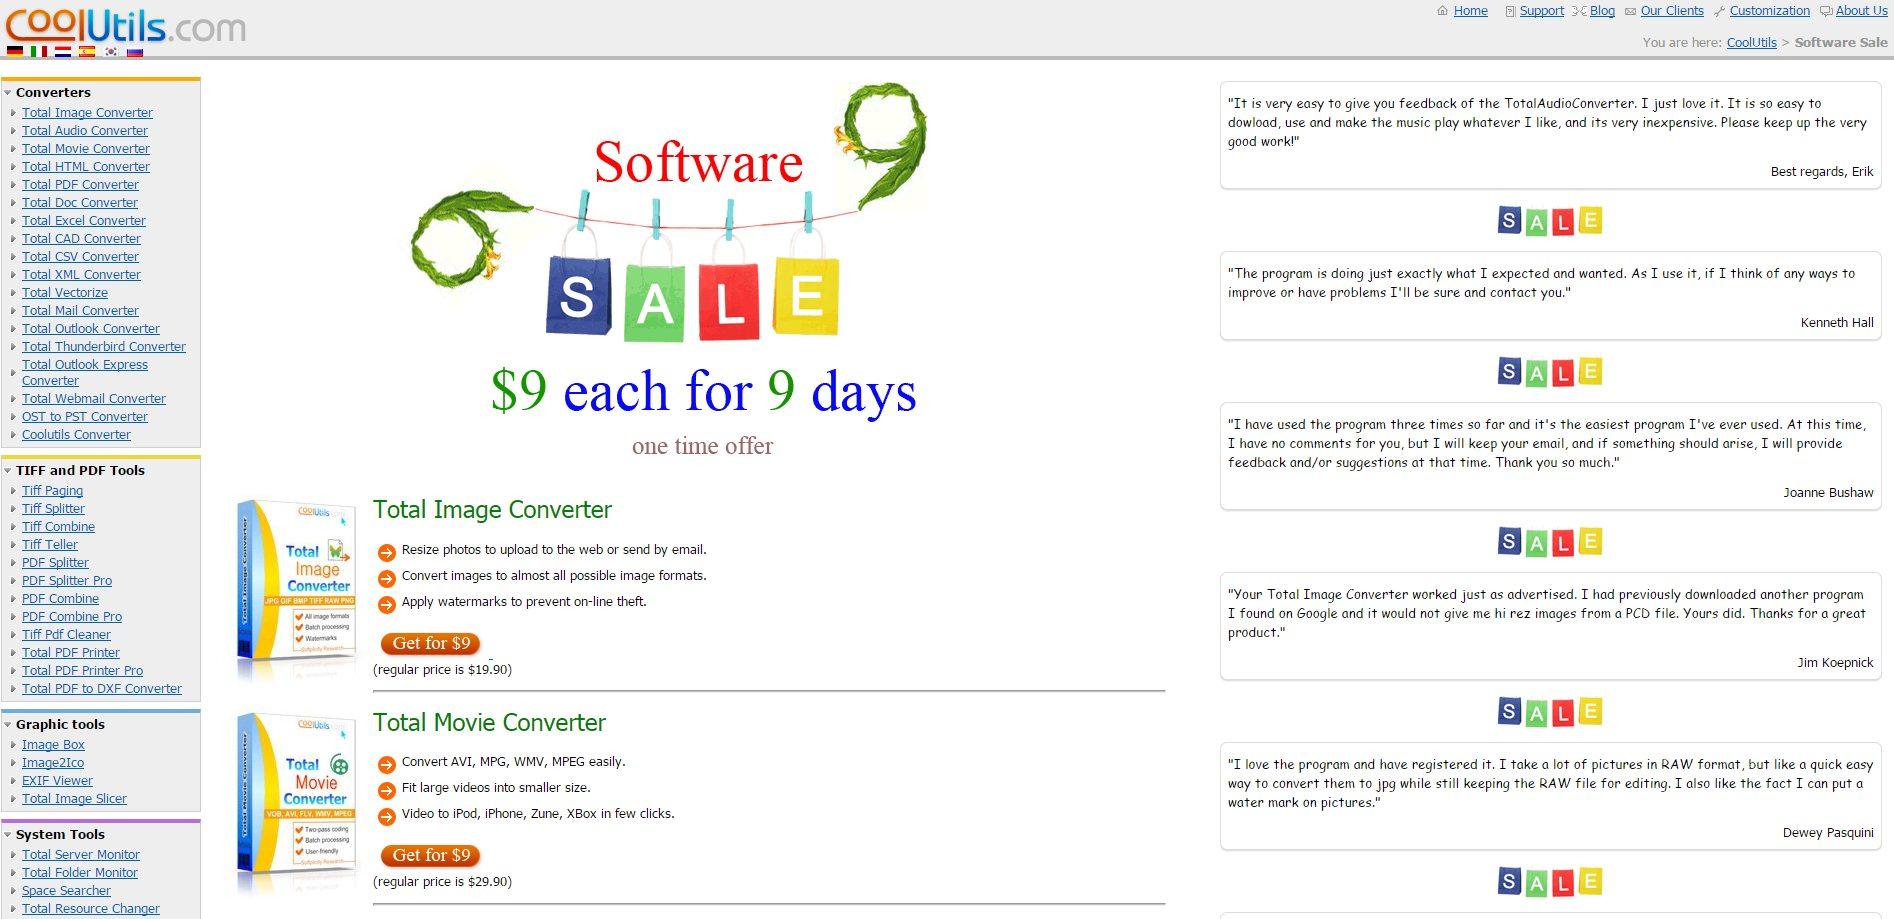 http://www.coolutils.com/softwaresale9.php